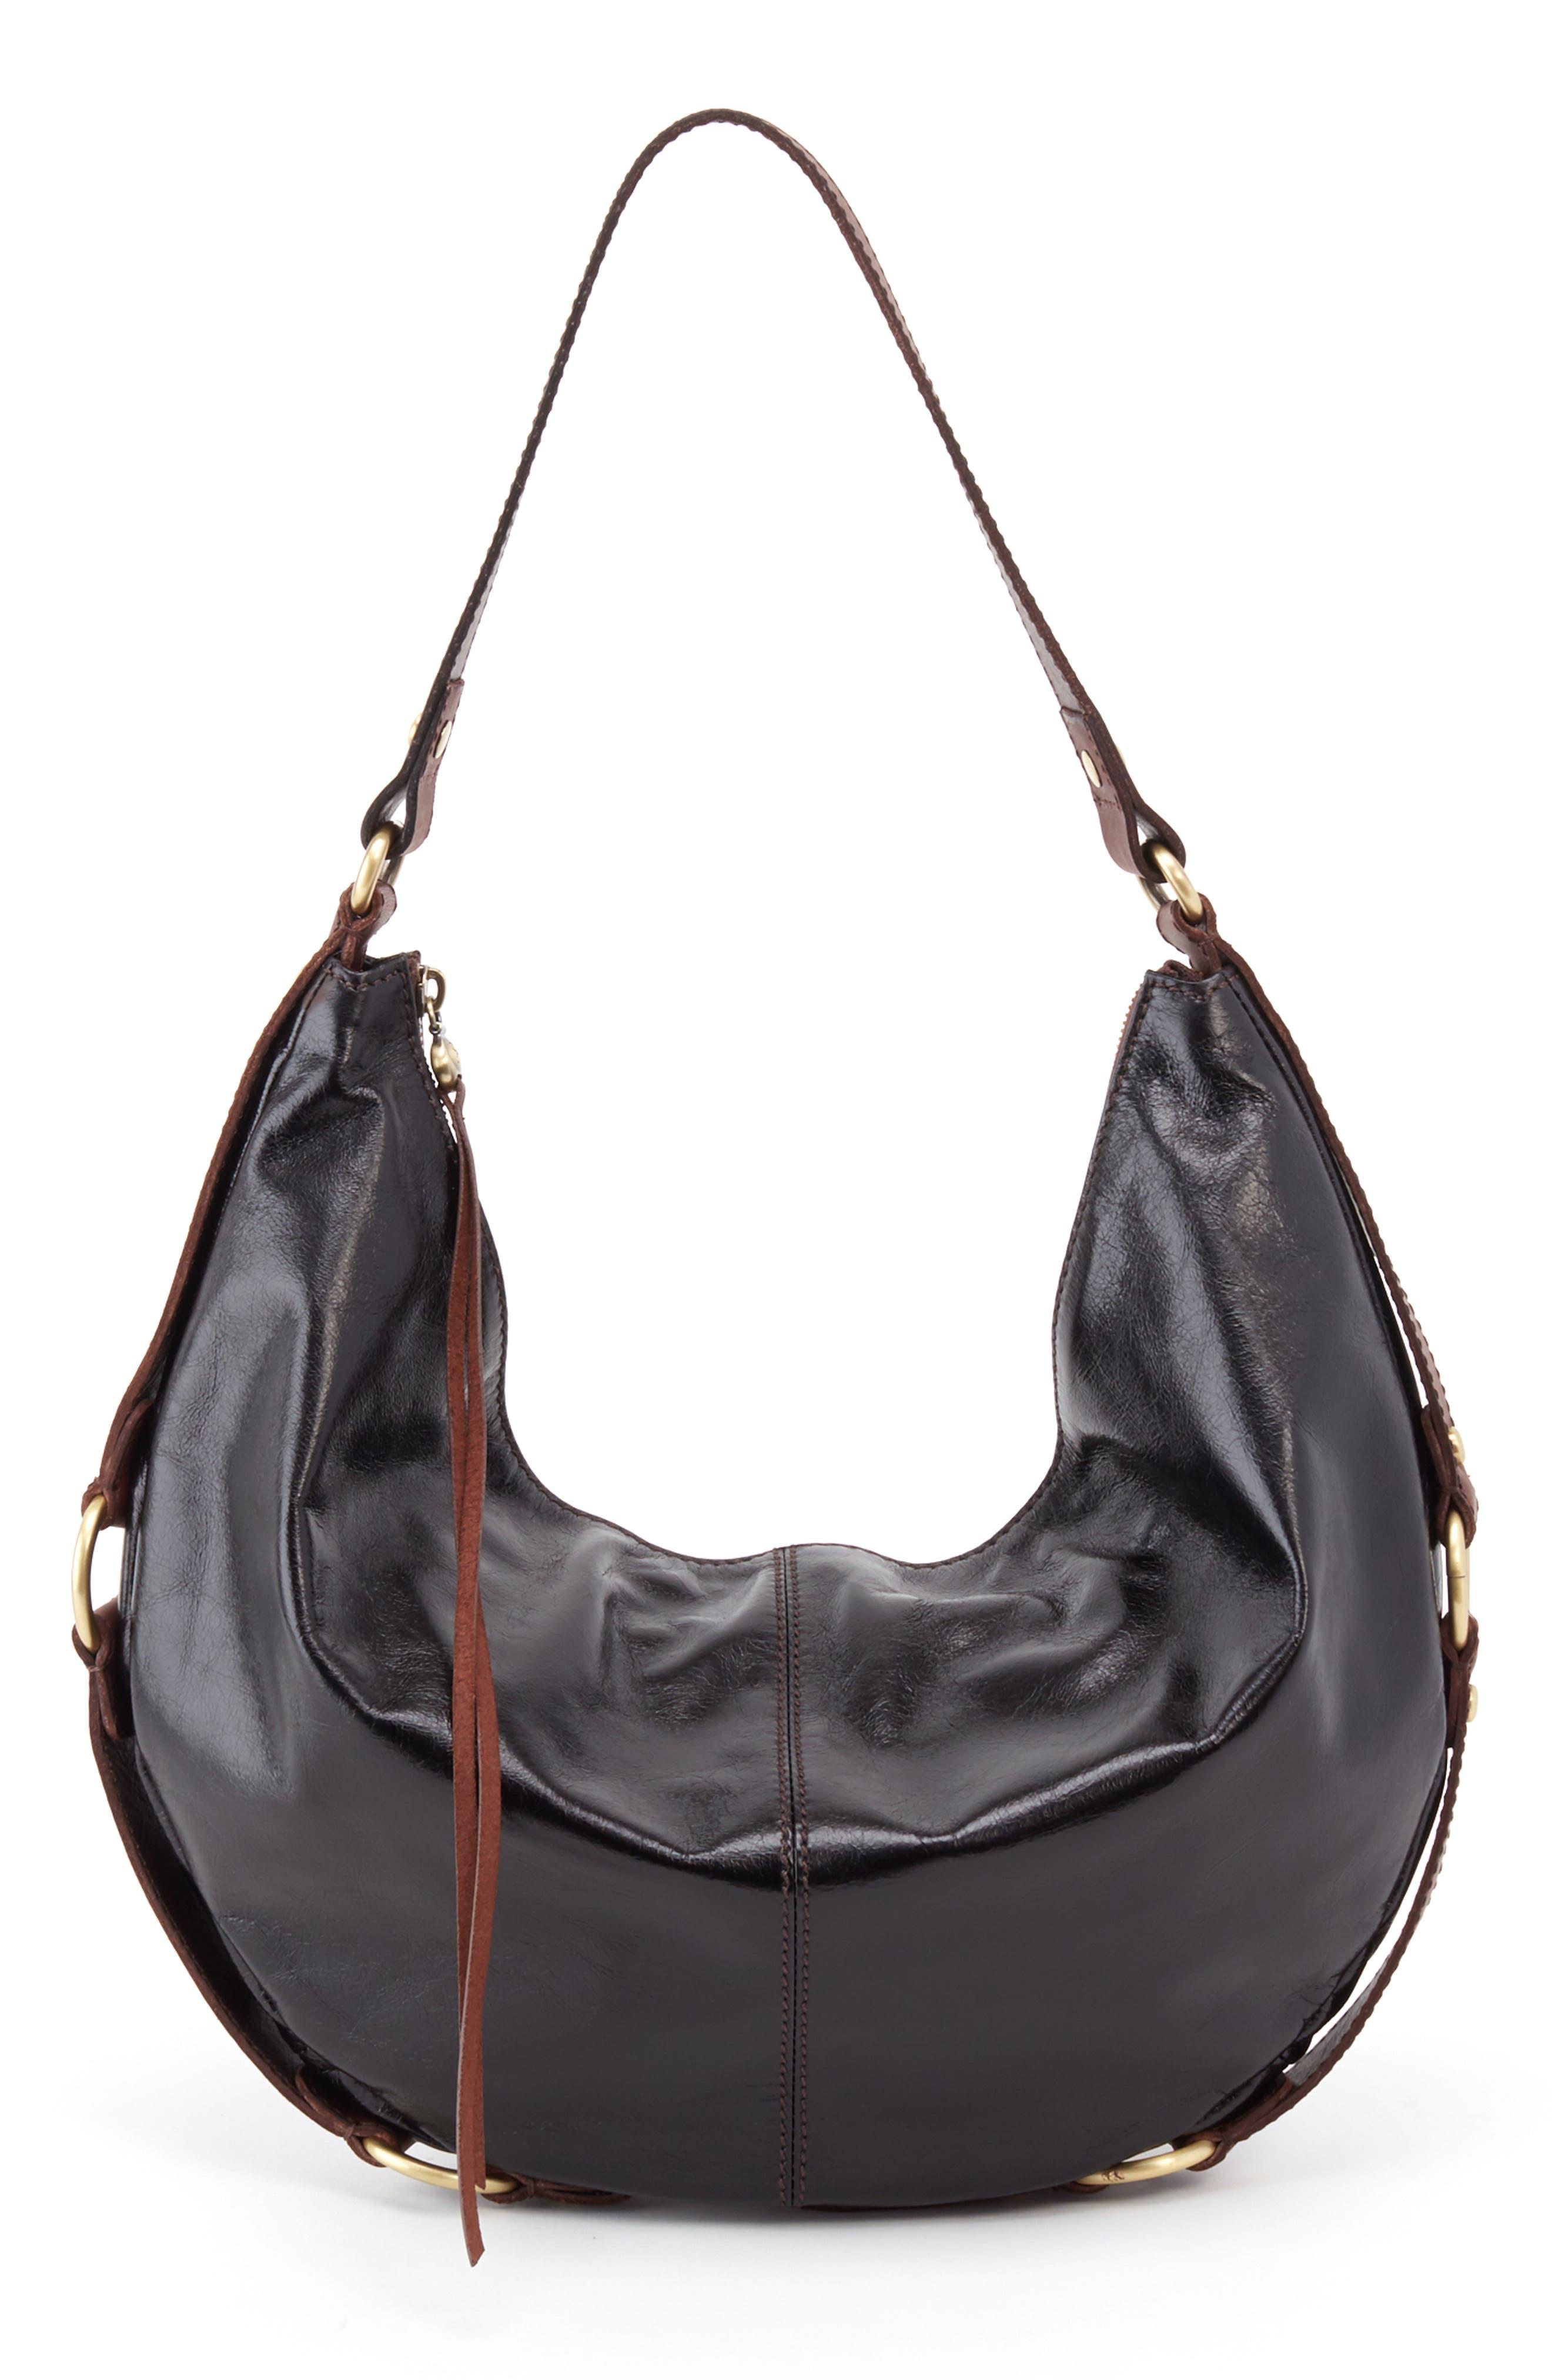 Rogue Shoulder Bag,                             Main thumbnail 1, color,                             BLACK